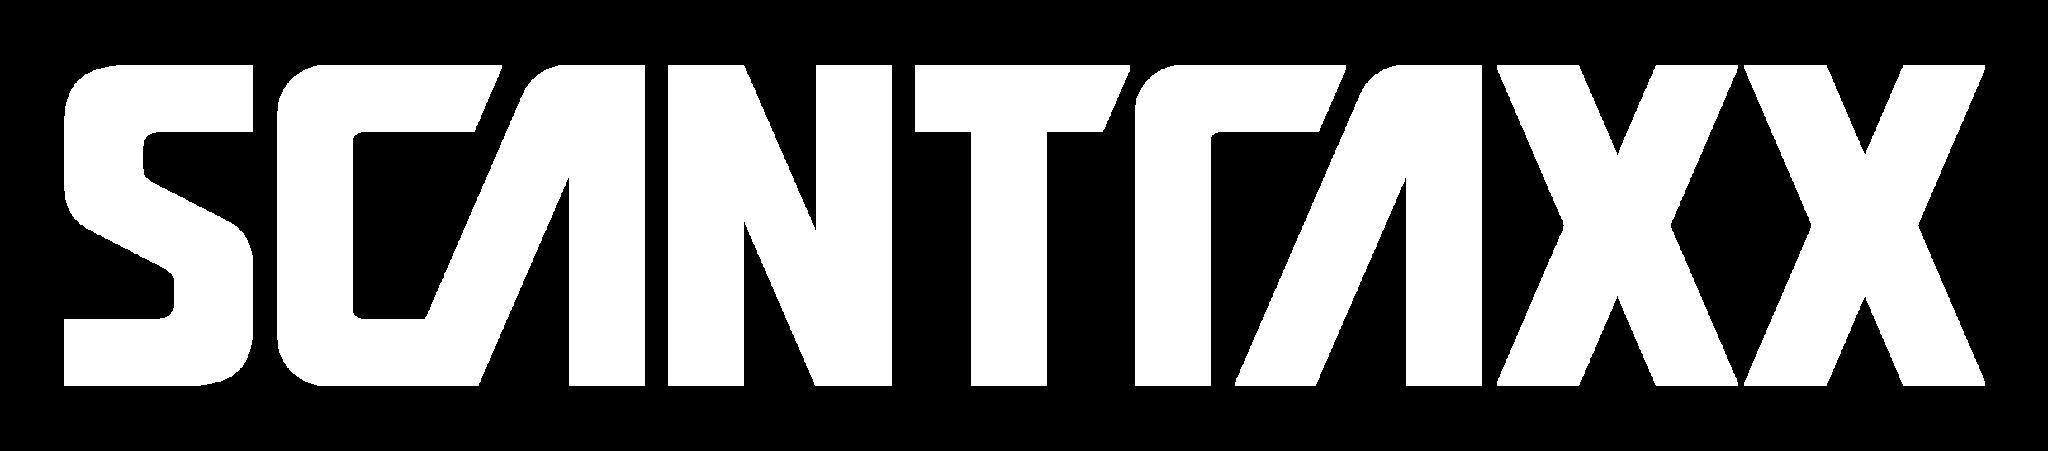 Hardstyle.com | Scantraxx